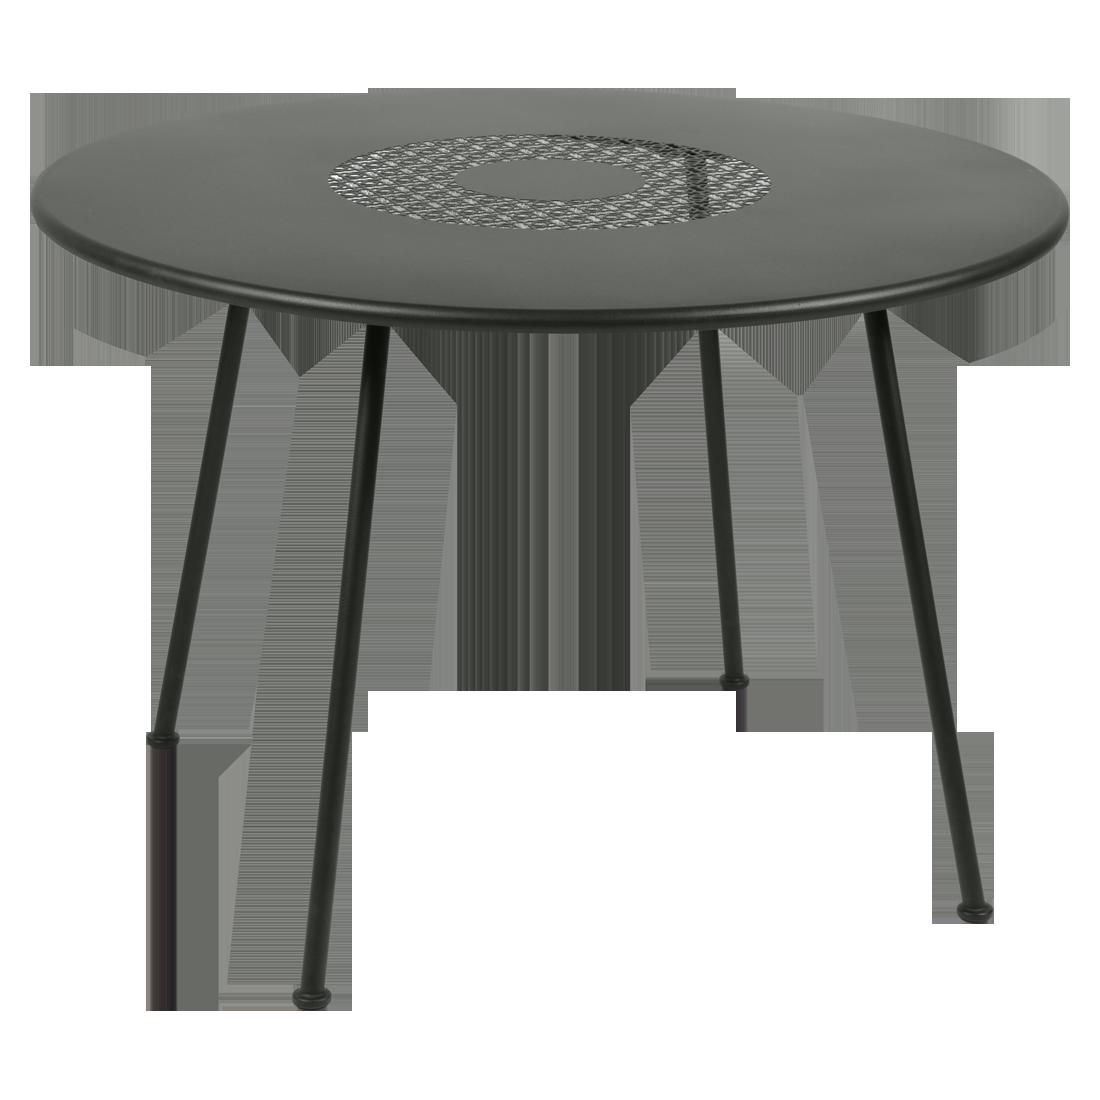 Table Ø 110 cm lorette romarin